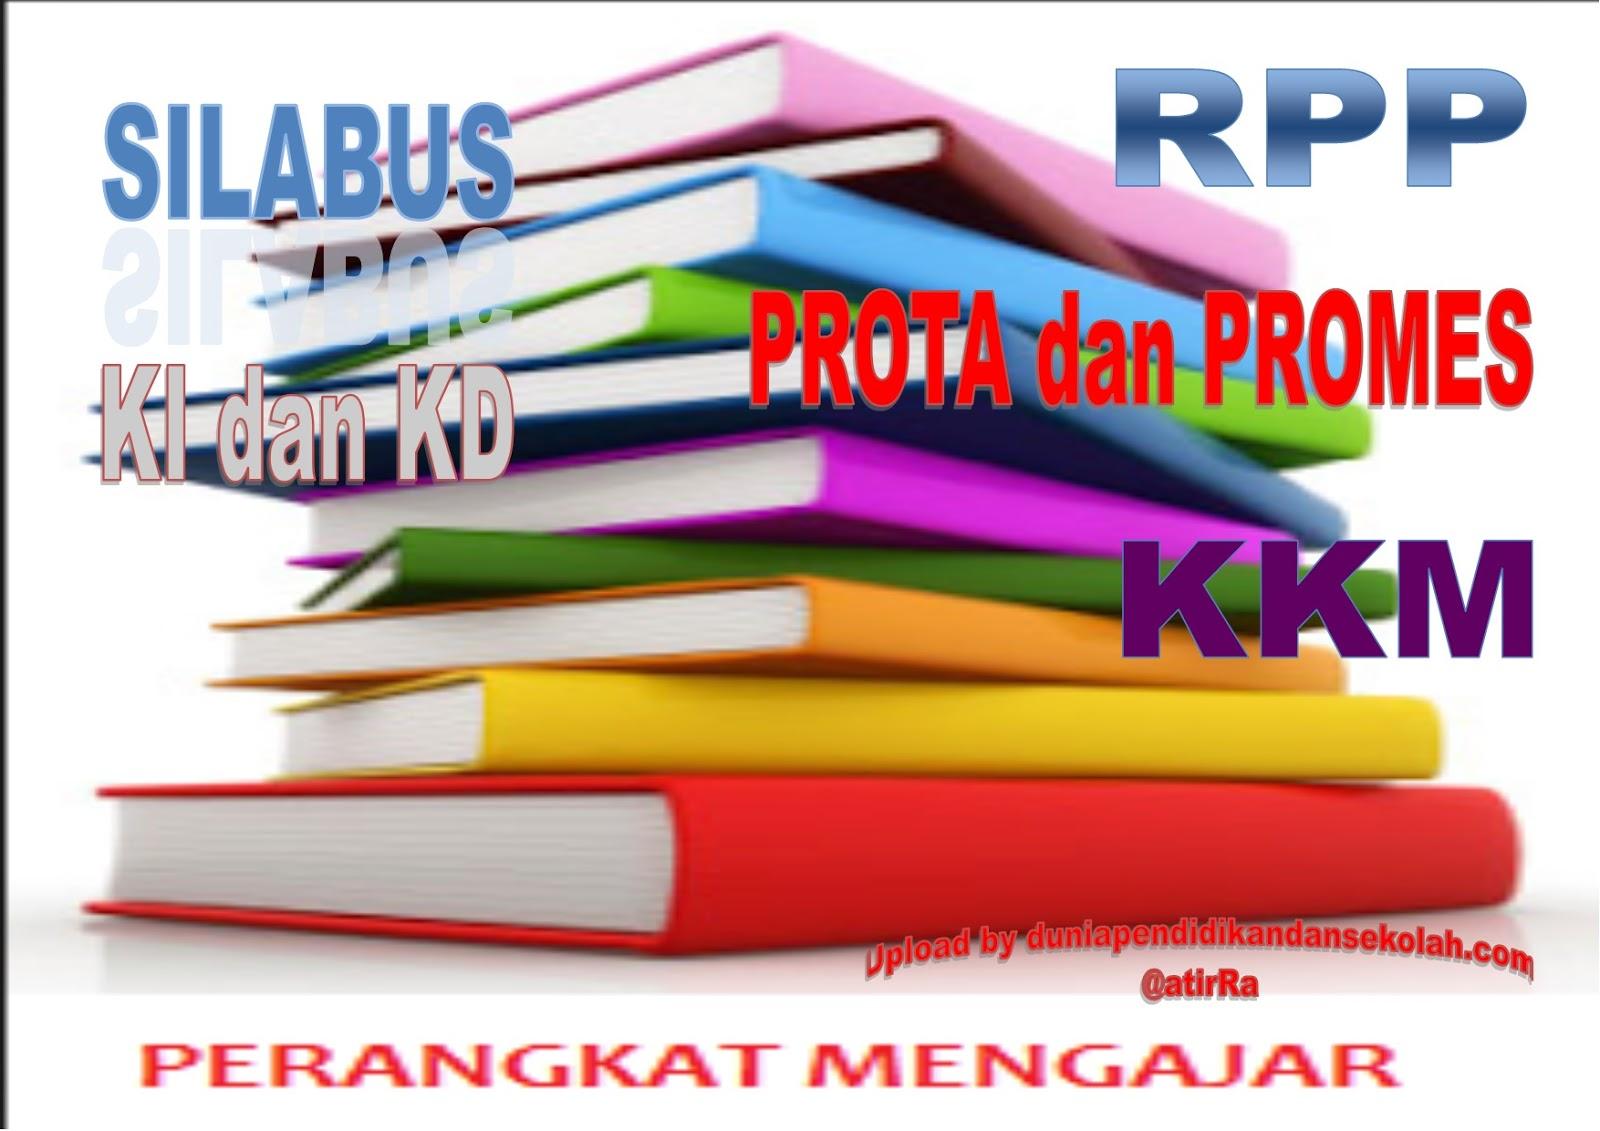 Download Lengkap Rpp Pai Kelas 1 2 3 4 5 6 Semester 1 Dan 2 Revisi 2017 Kurikulum 2013 Dunia